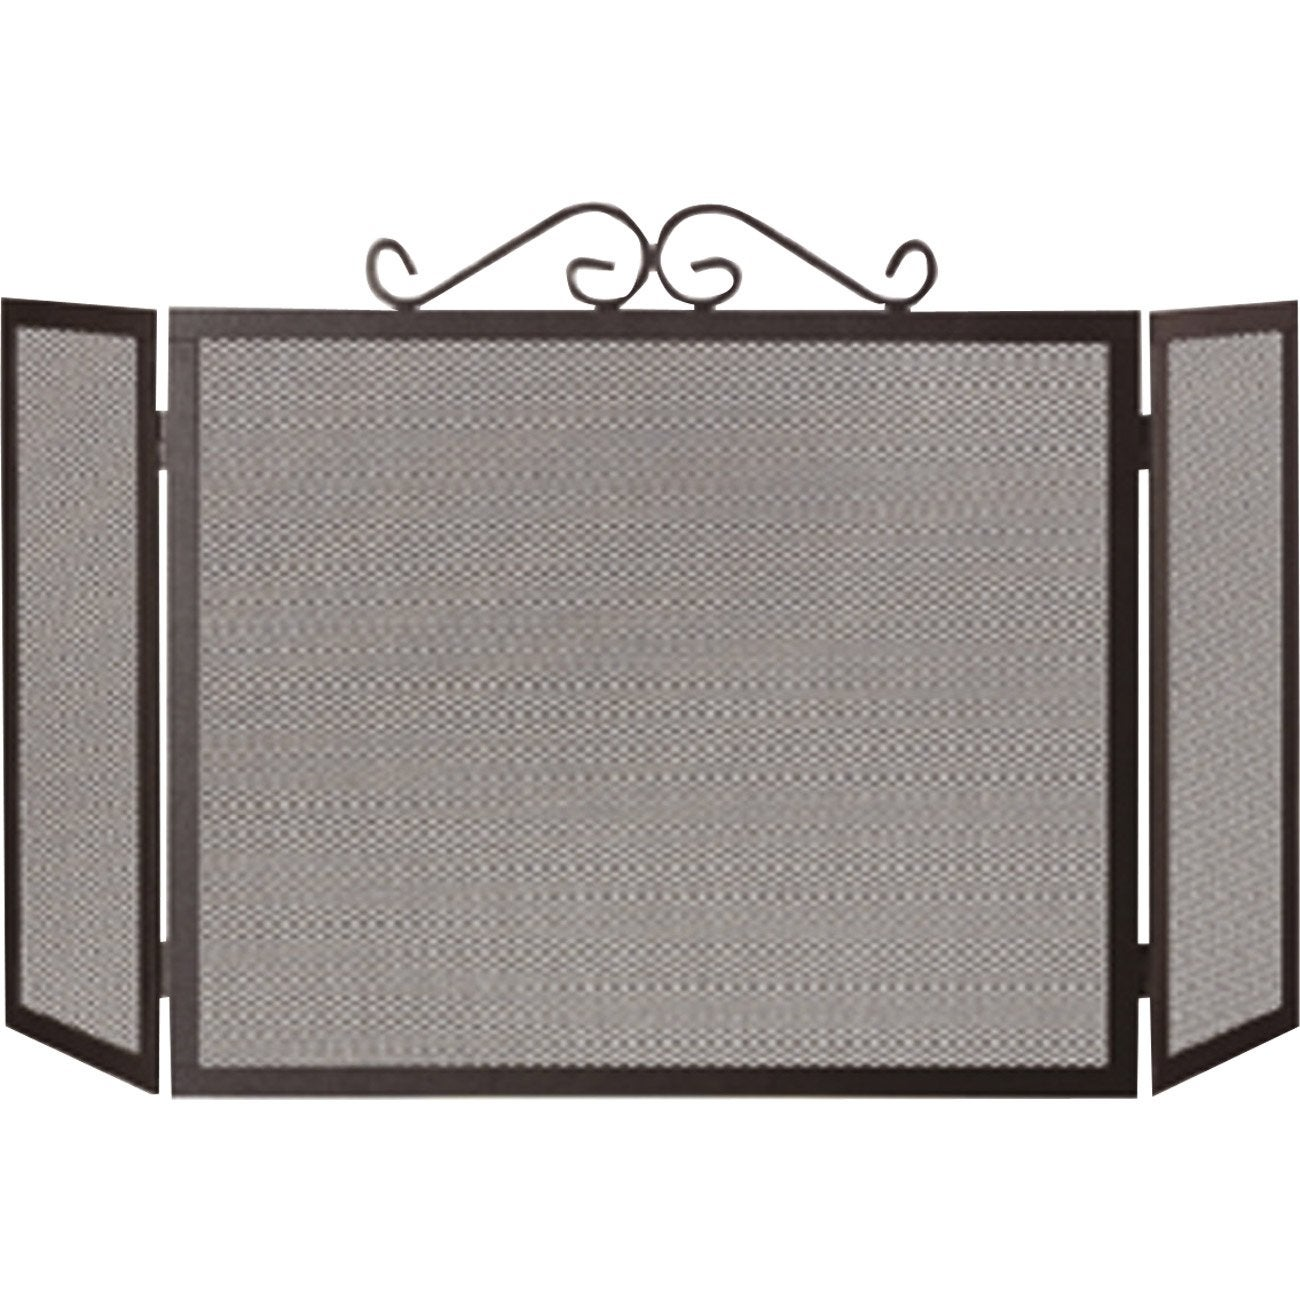 pare feu en fer delta quartz 3 volets x cm leroy merlin. Black Bedroom Furniture Sets. Home Design Ideas